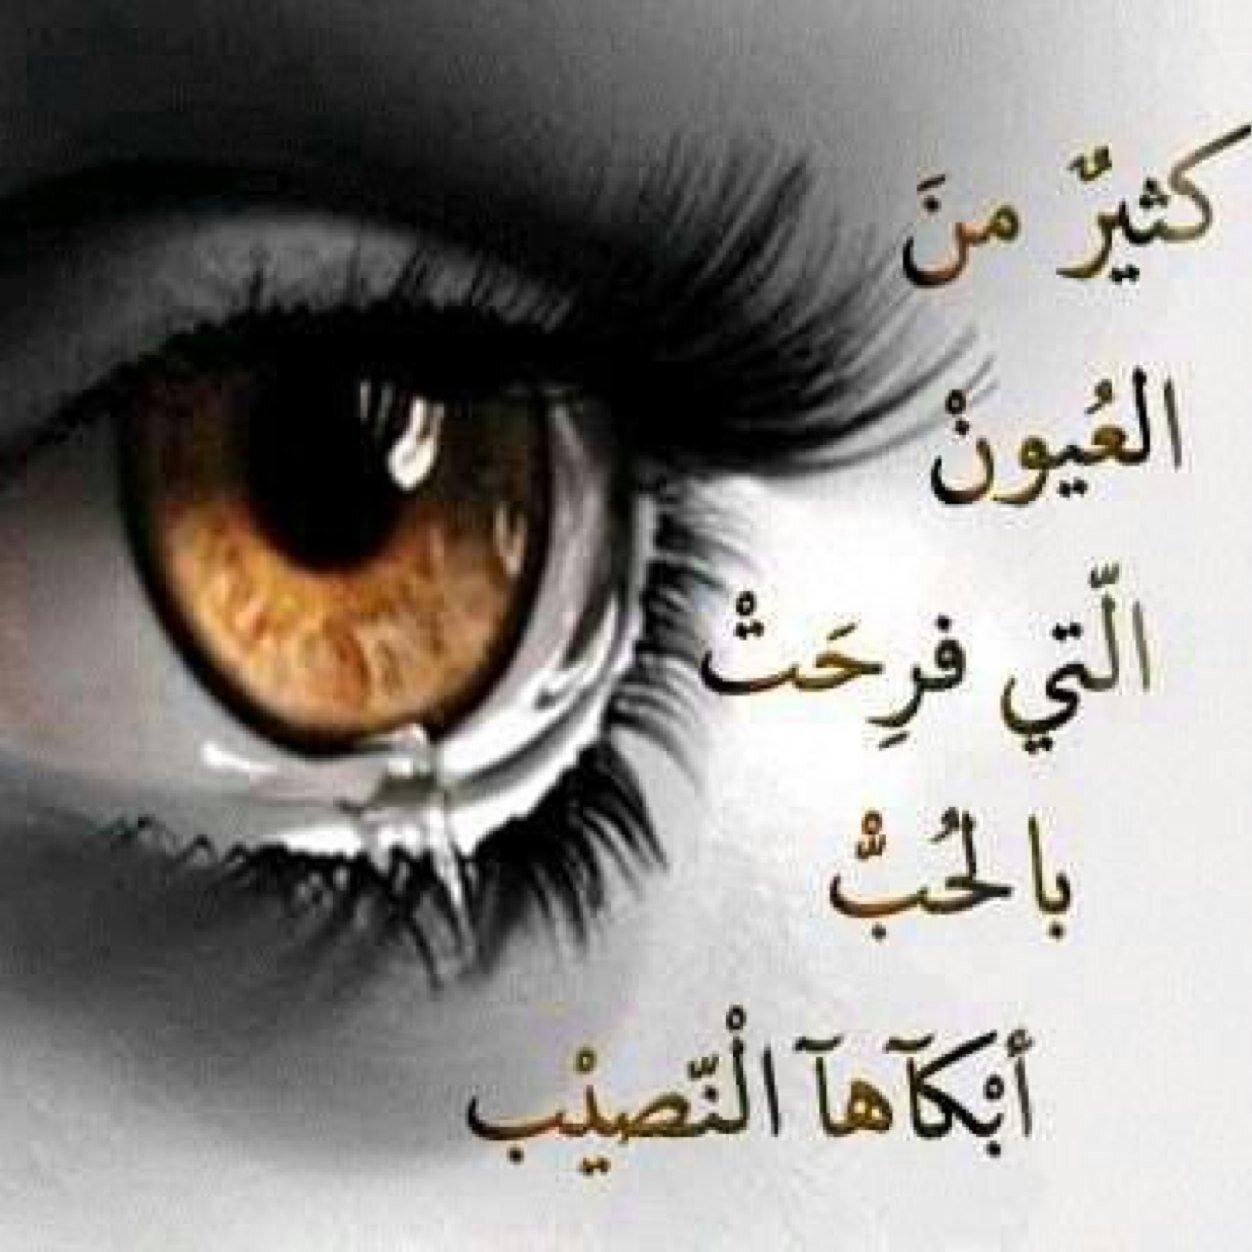 حبيبي يا نور العين Lailamohammed48 Twitter